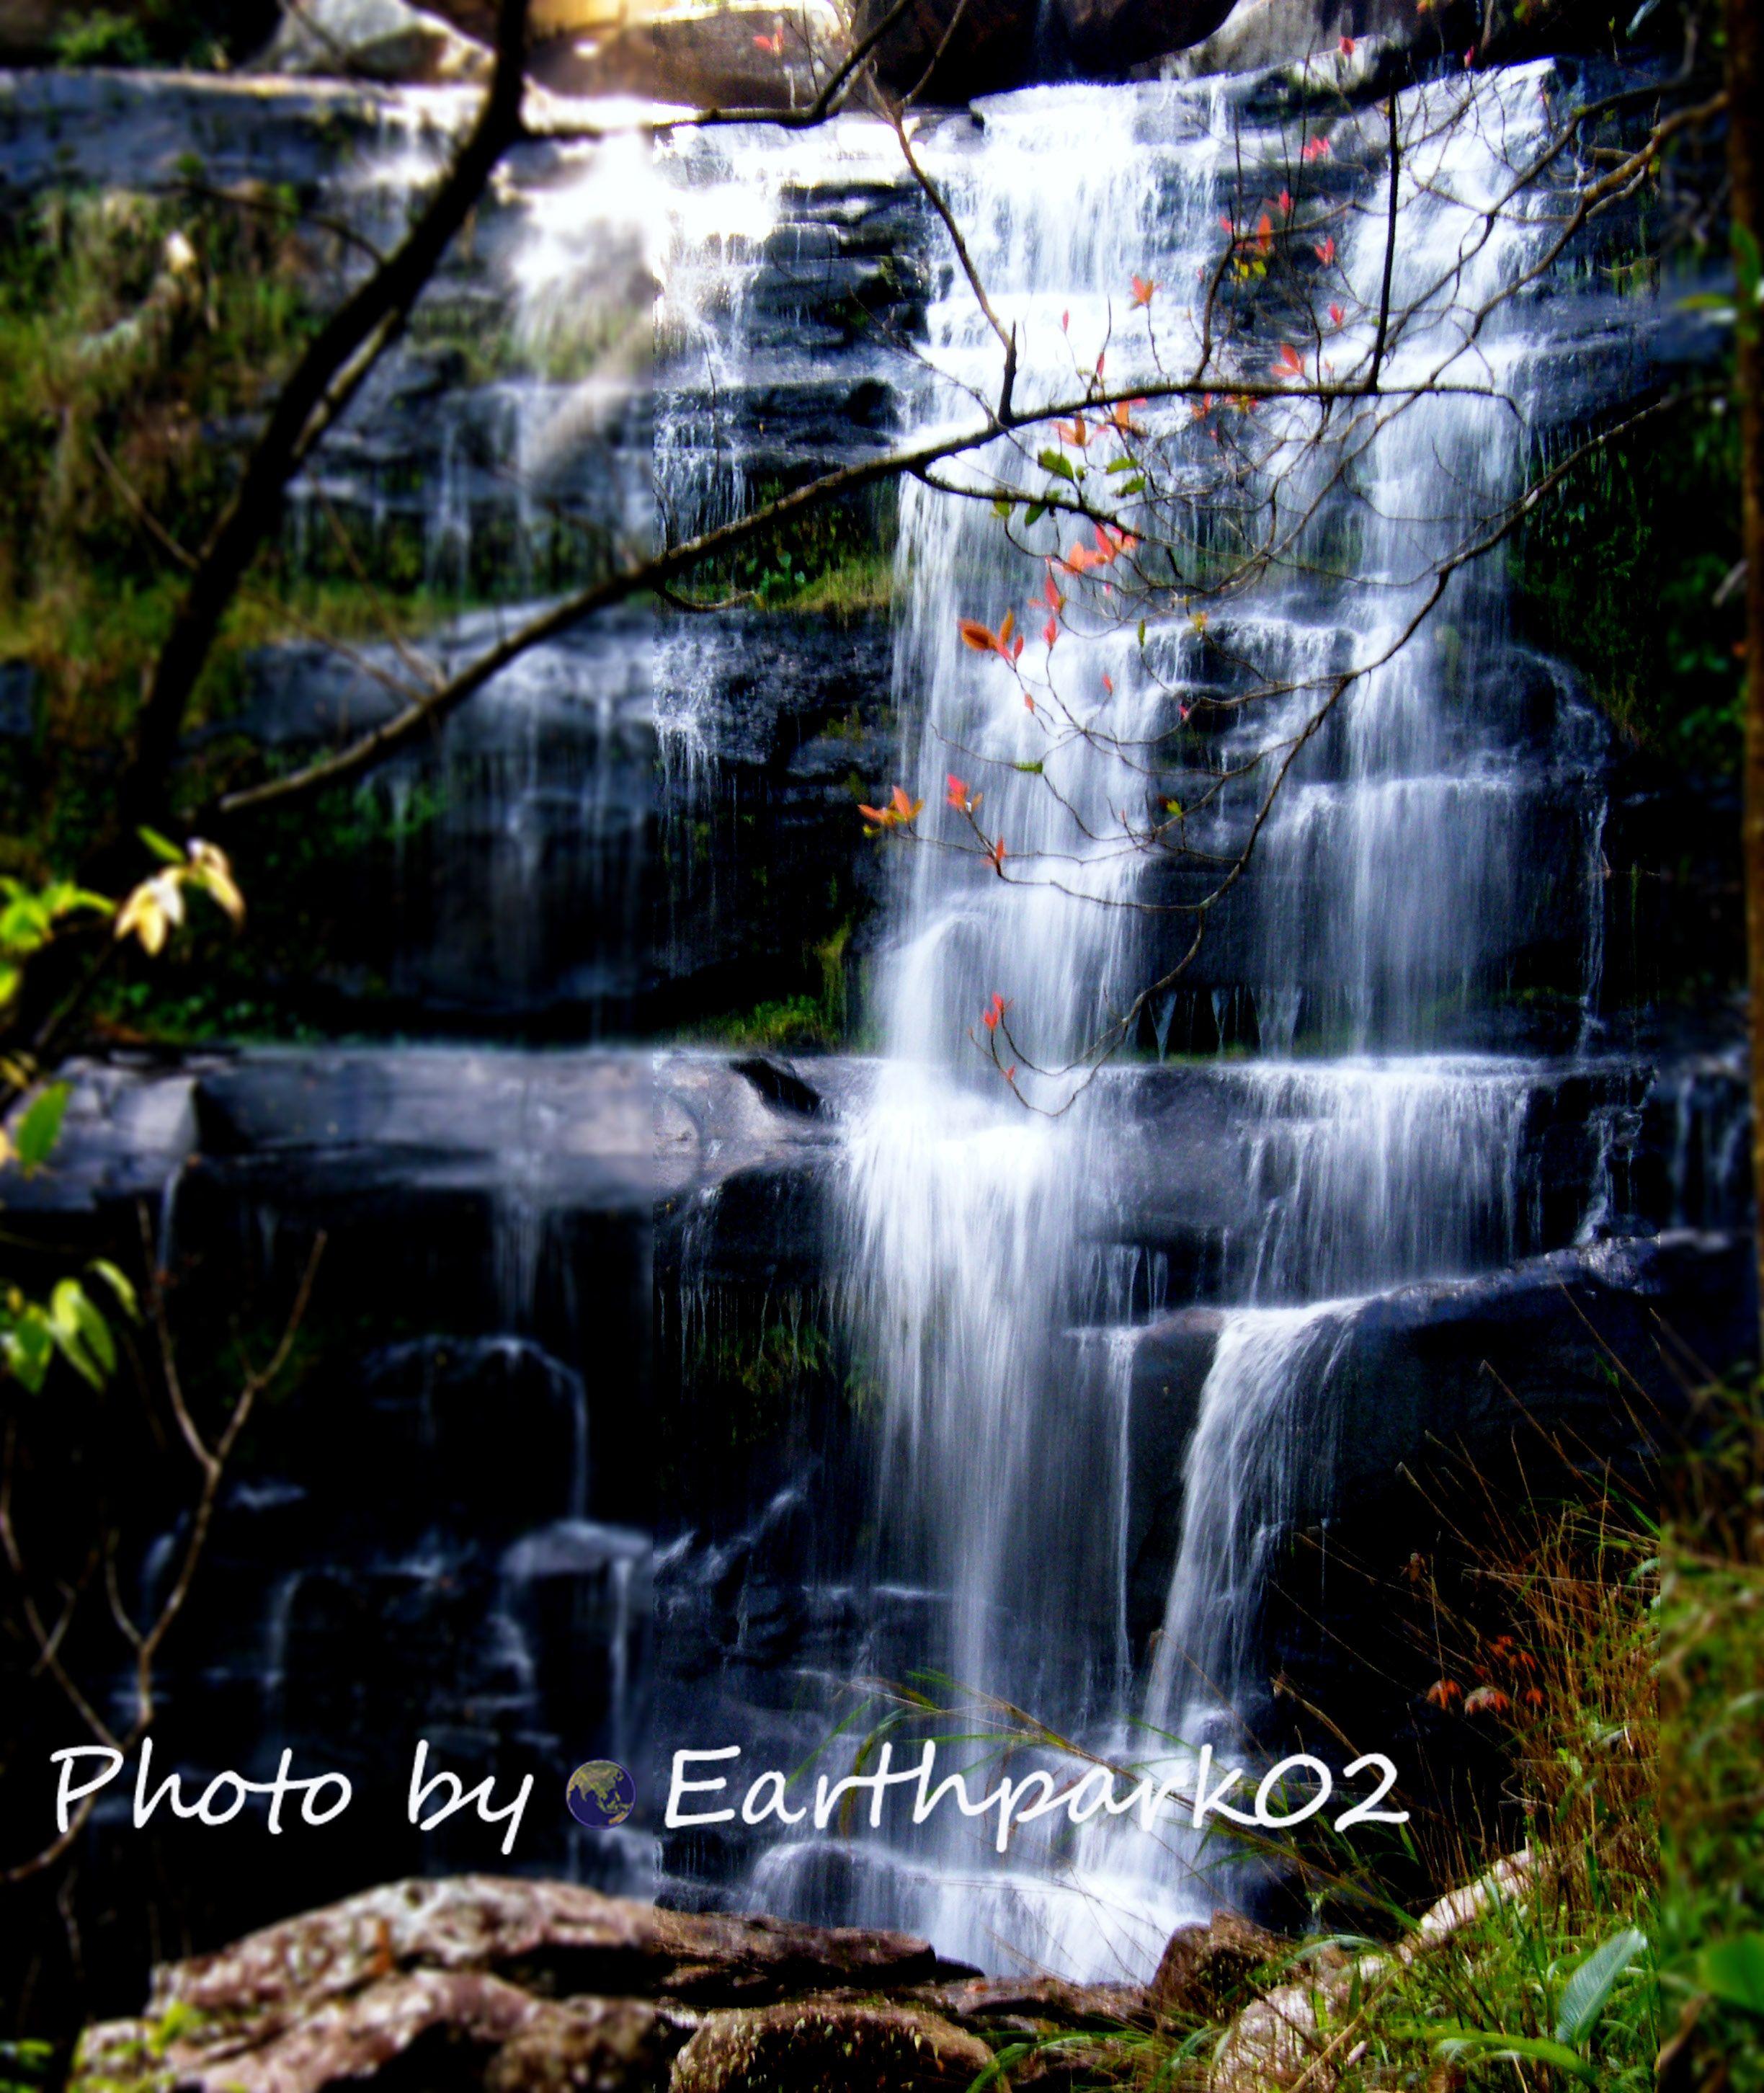 Waterfall @ Phukradueng